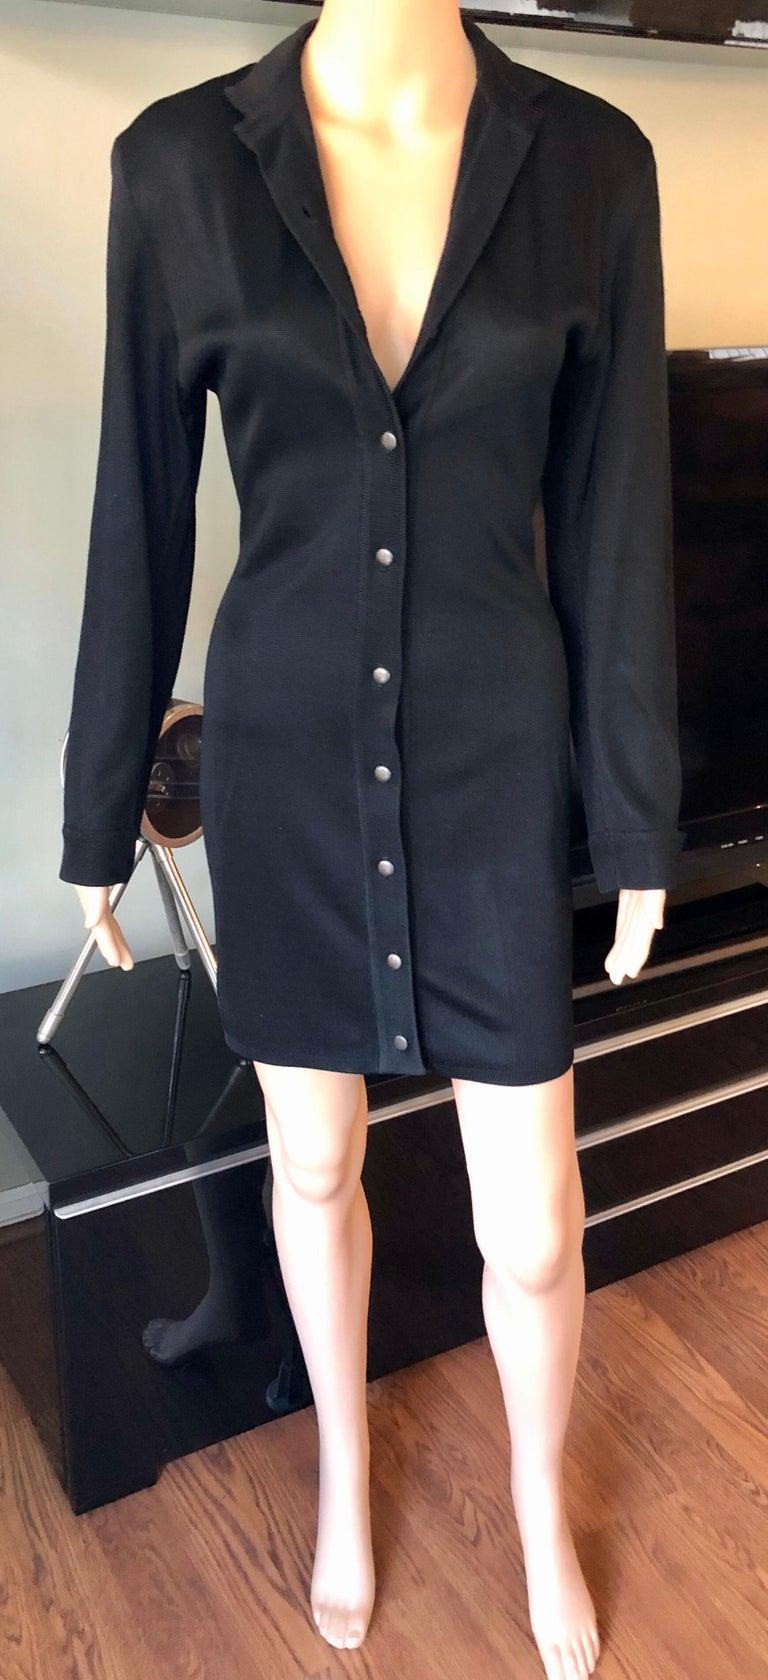 Women's Azzedine Alaia Vintage Buttoned Knit Black Dress